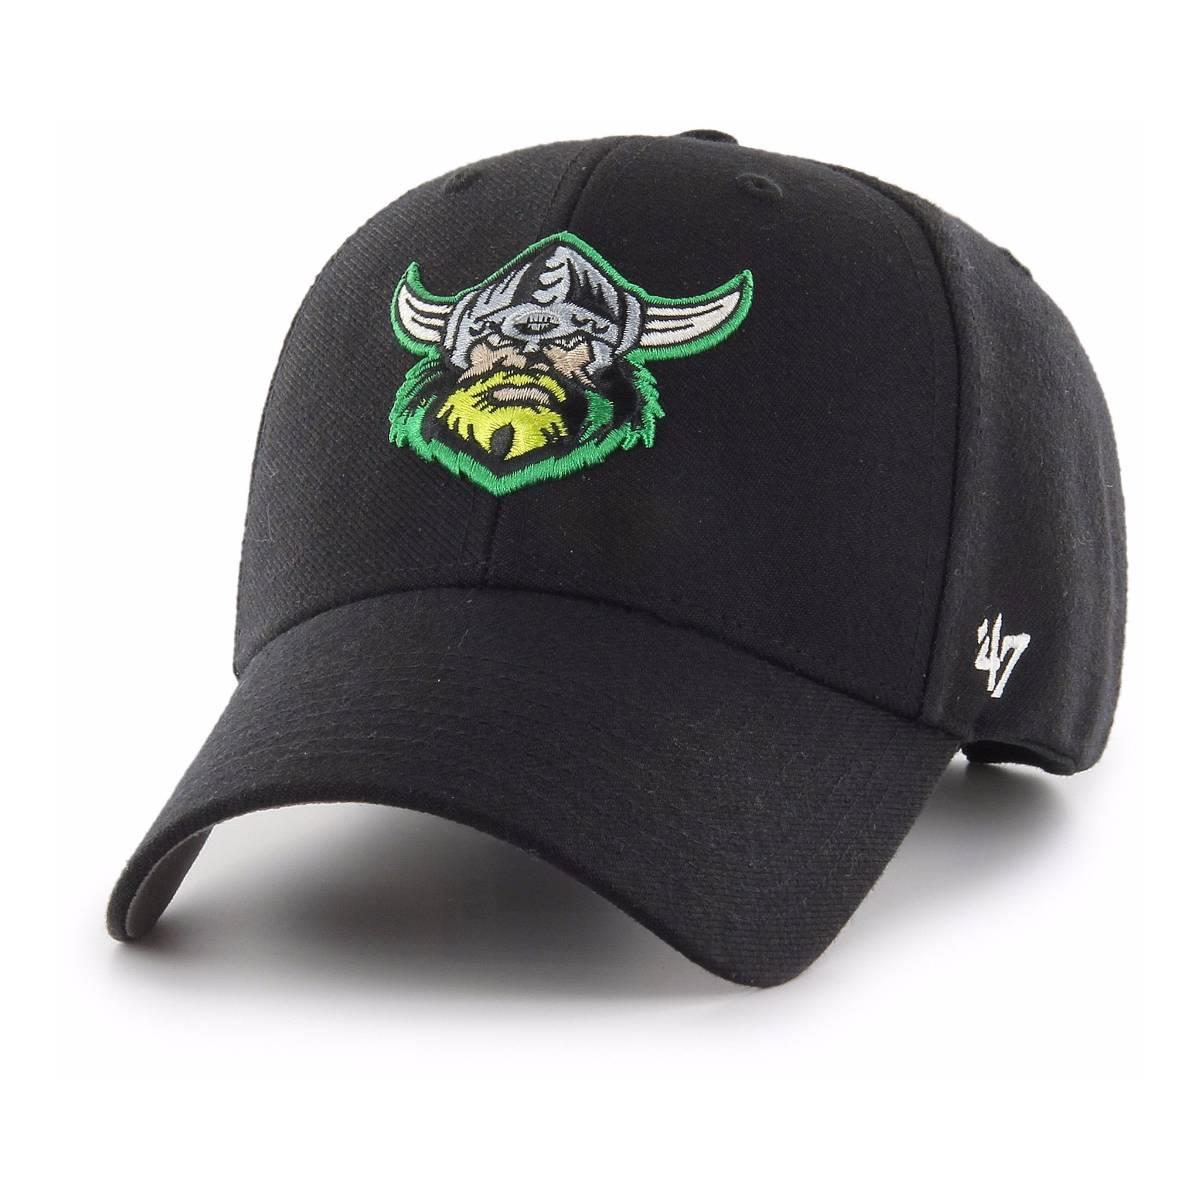 47 MVP Hat0